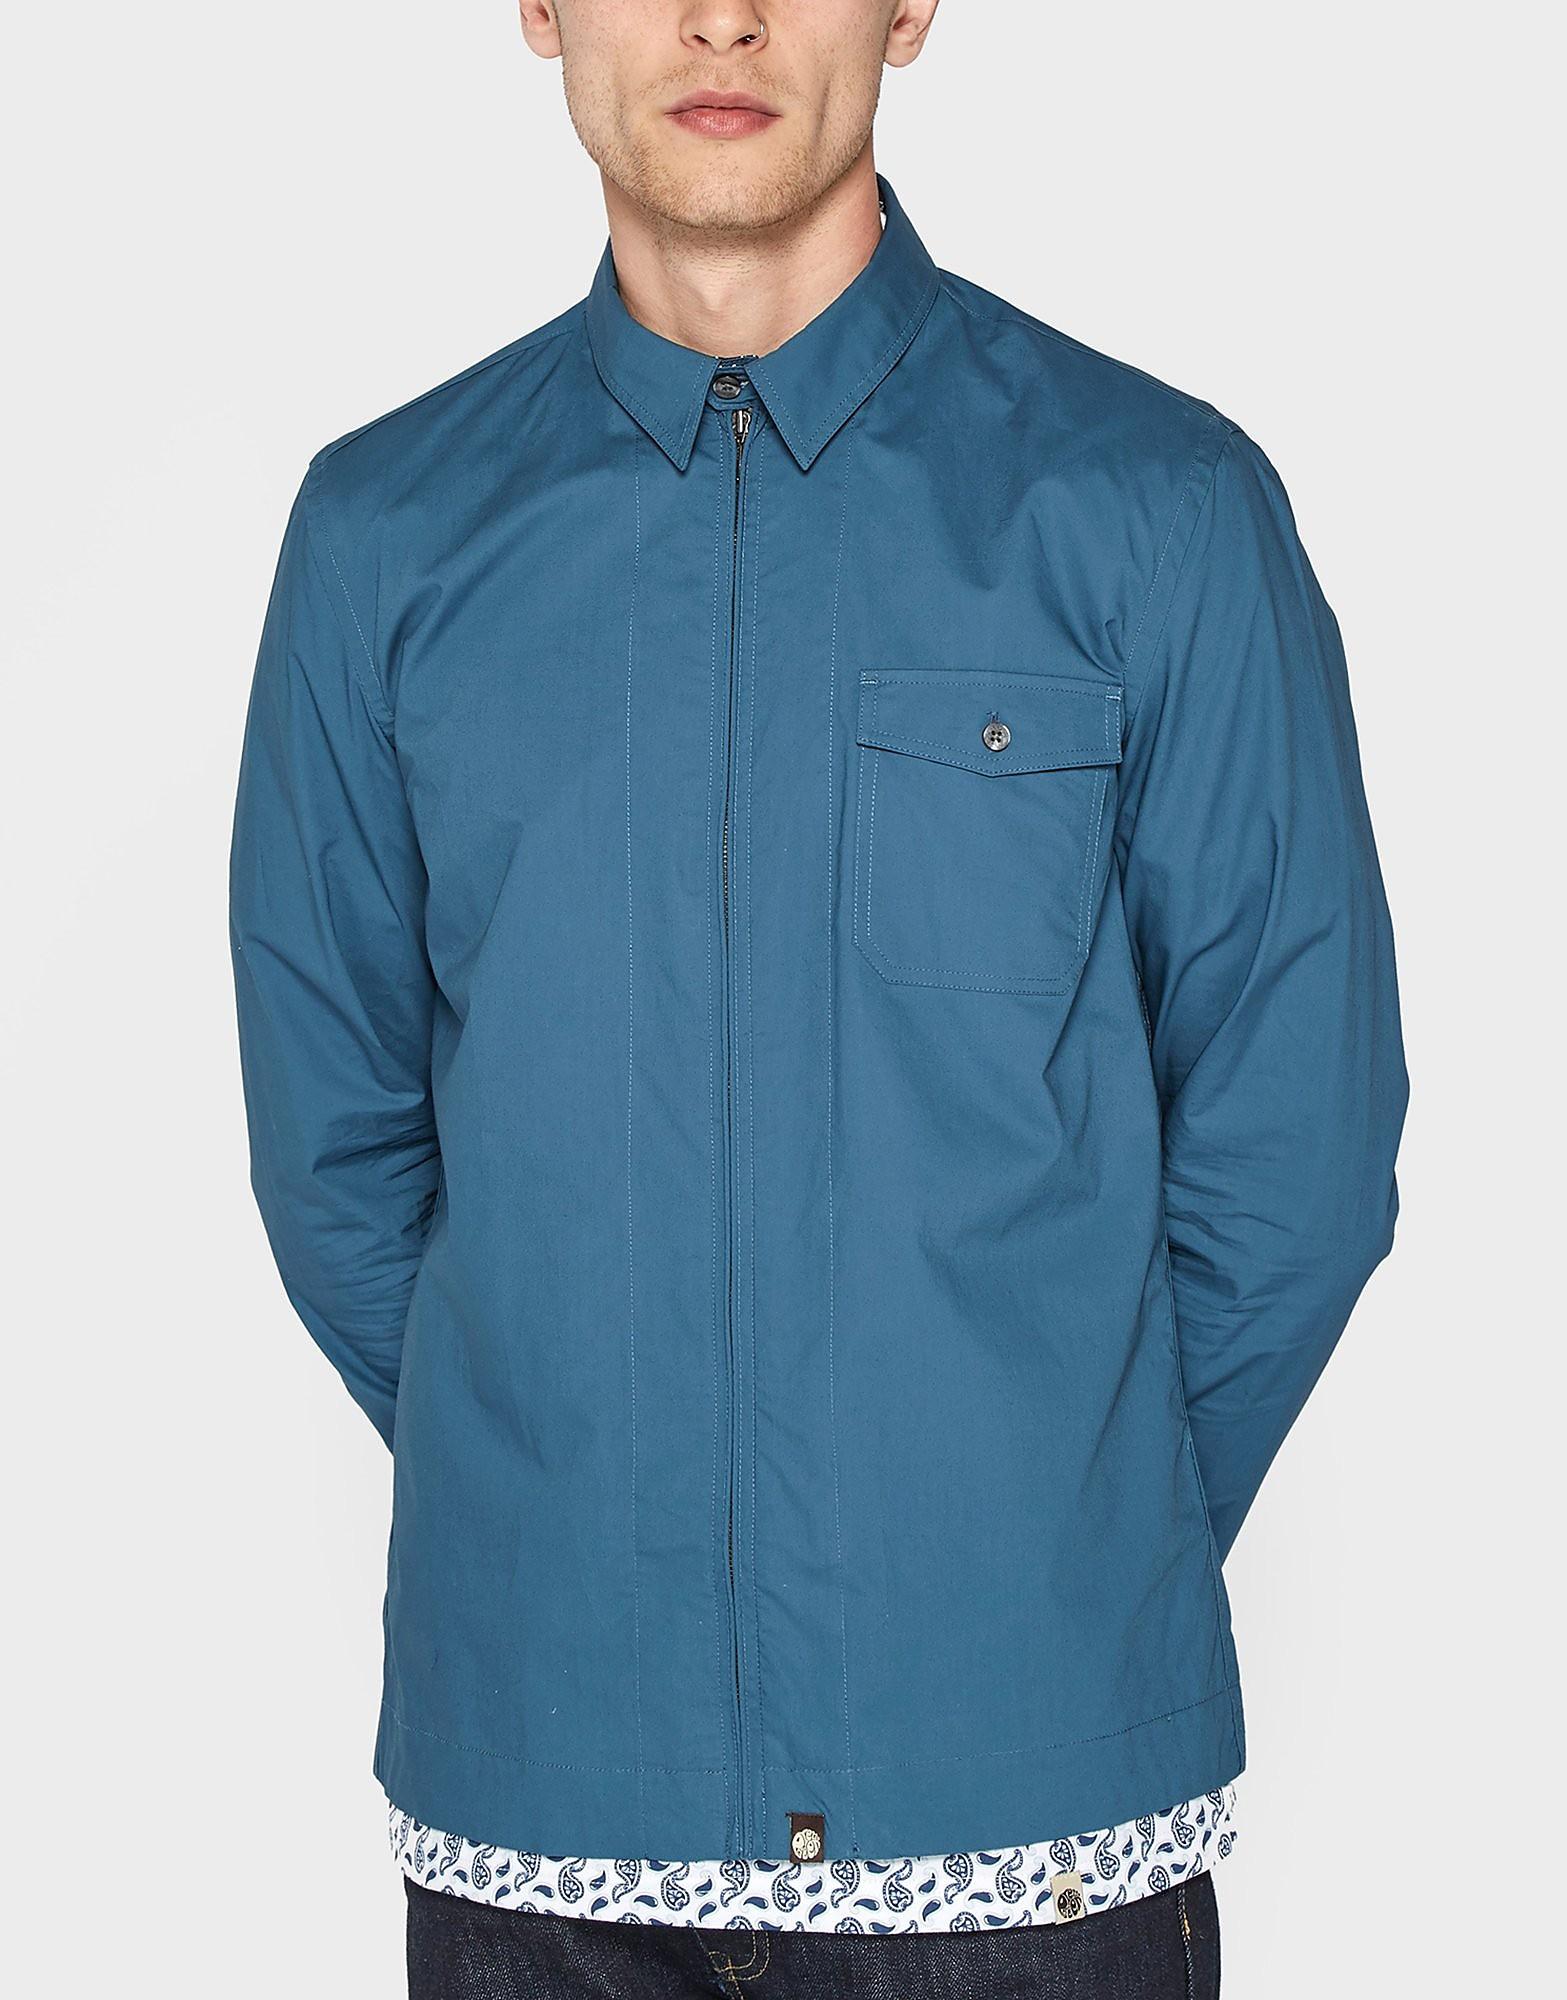 Pretty Green Zip Teal Shirt - Exclusive